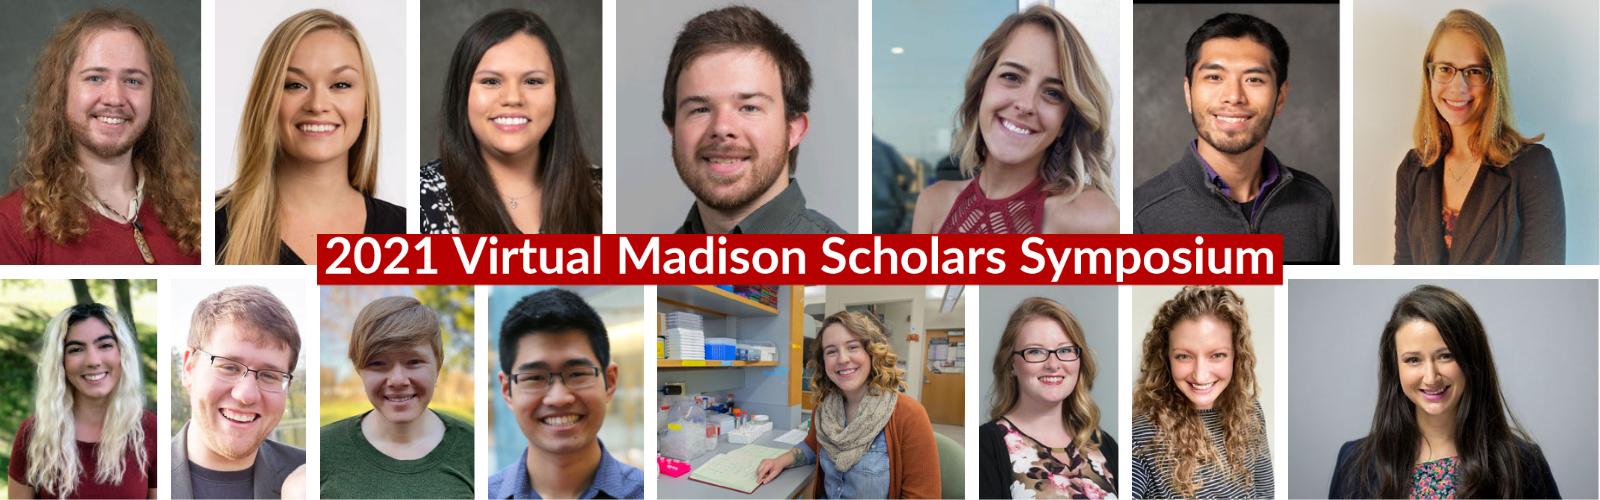 Virtual Madison Scholars Symposium Headshots of all Presenters